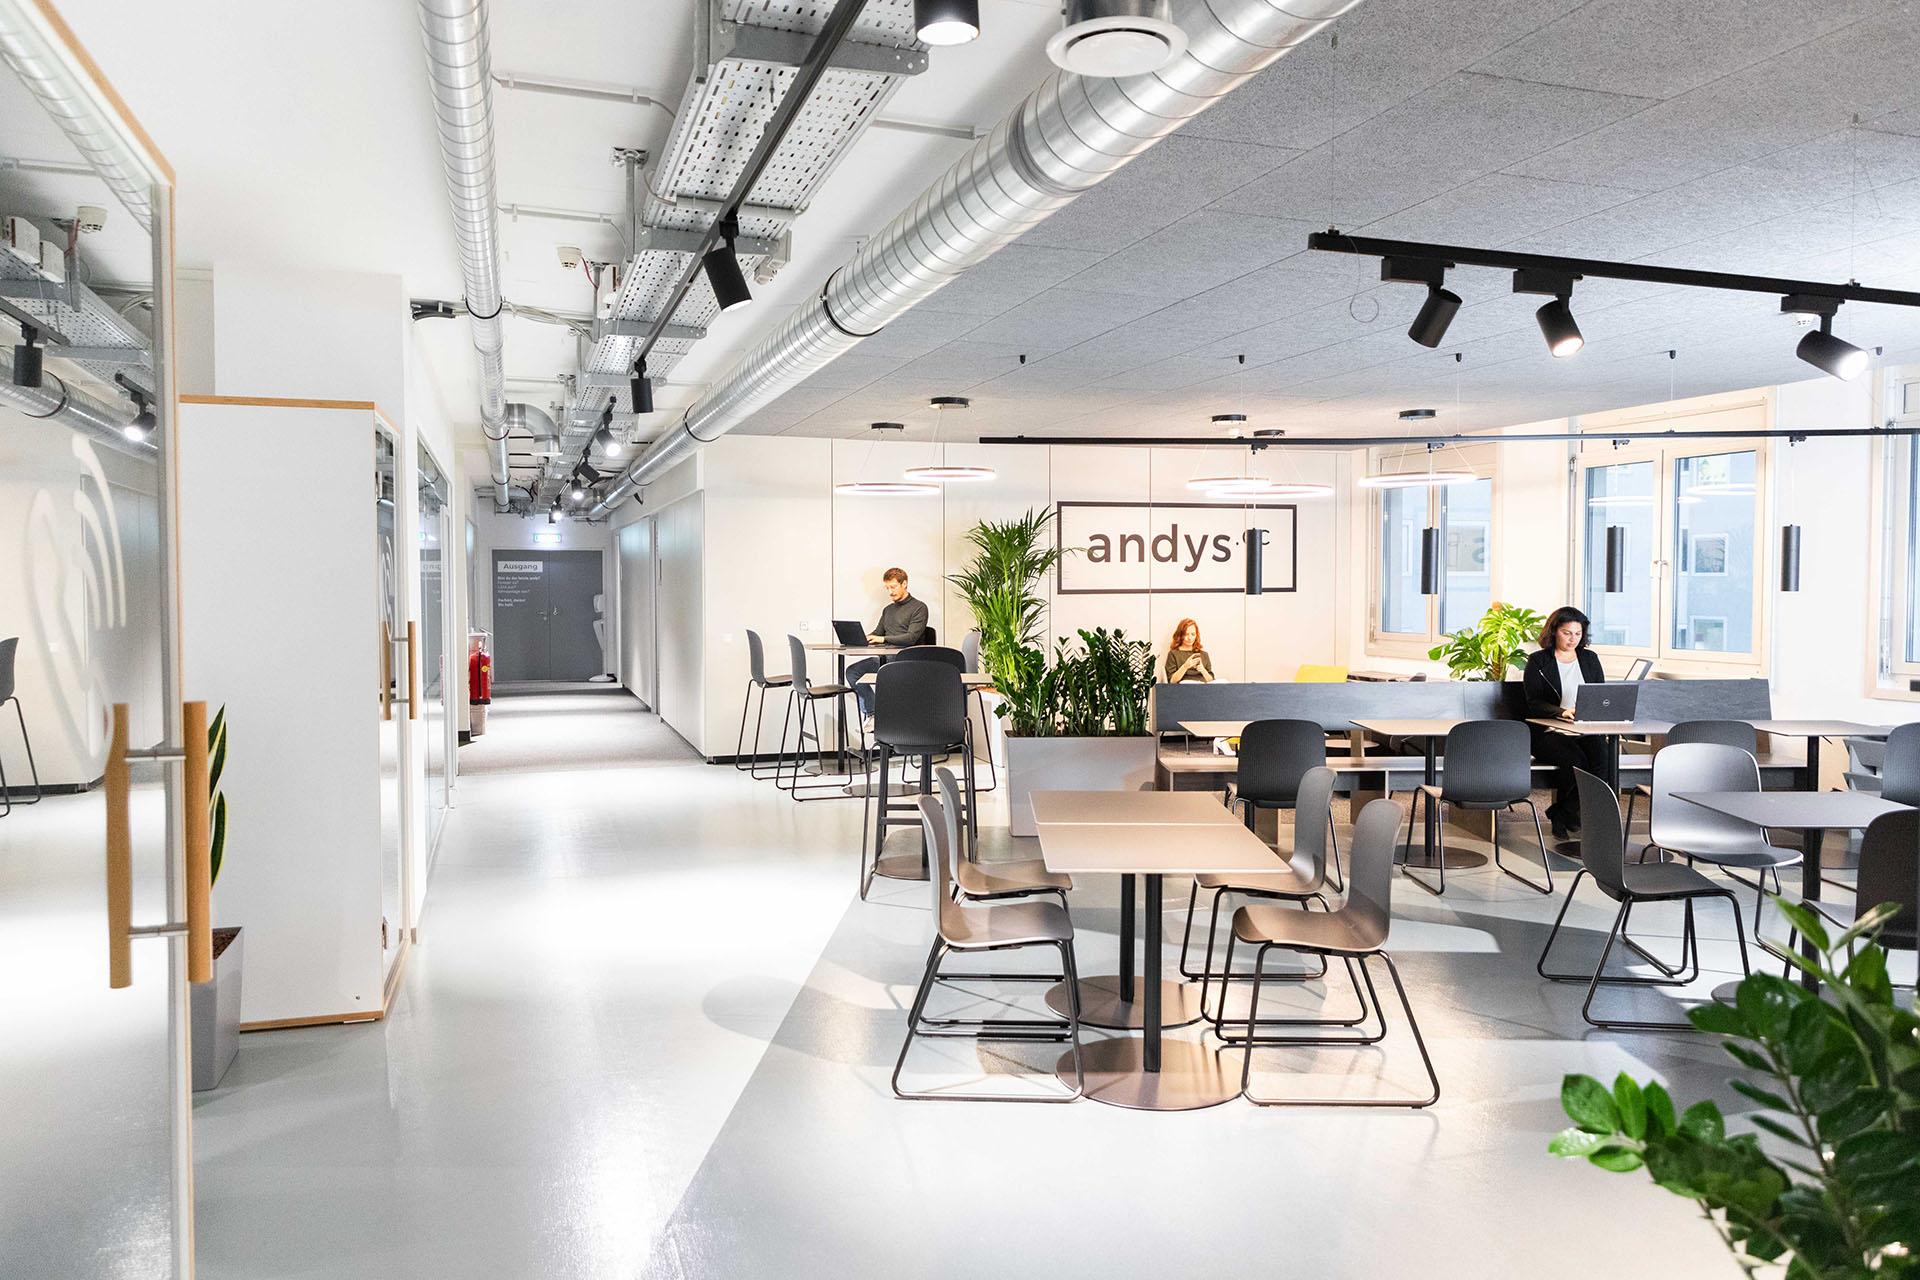 andys_coworking_center_lassallestraße_openspace